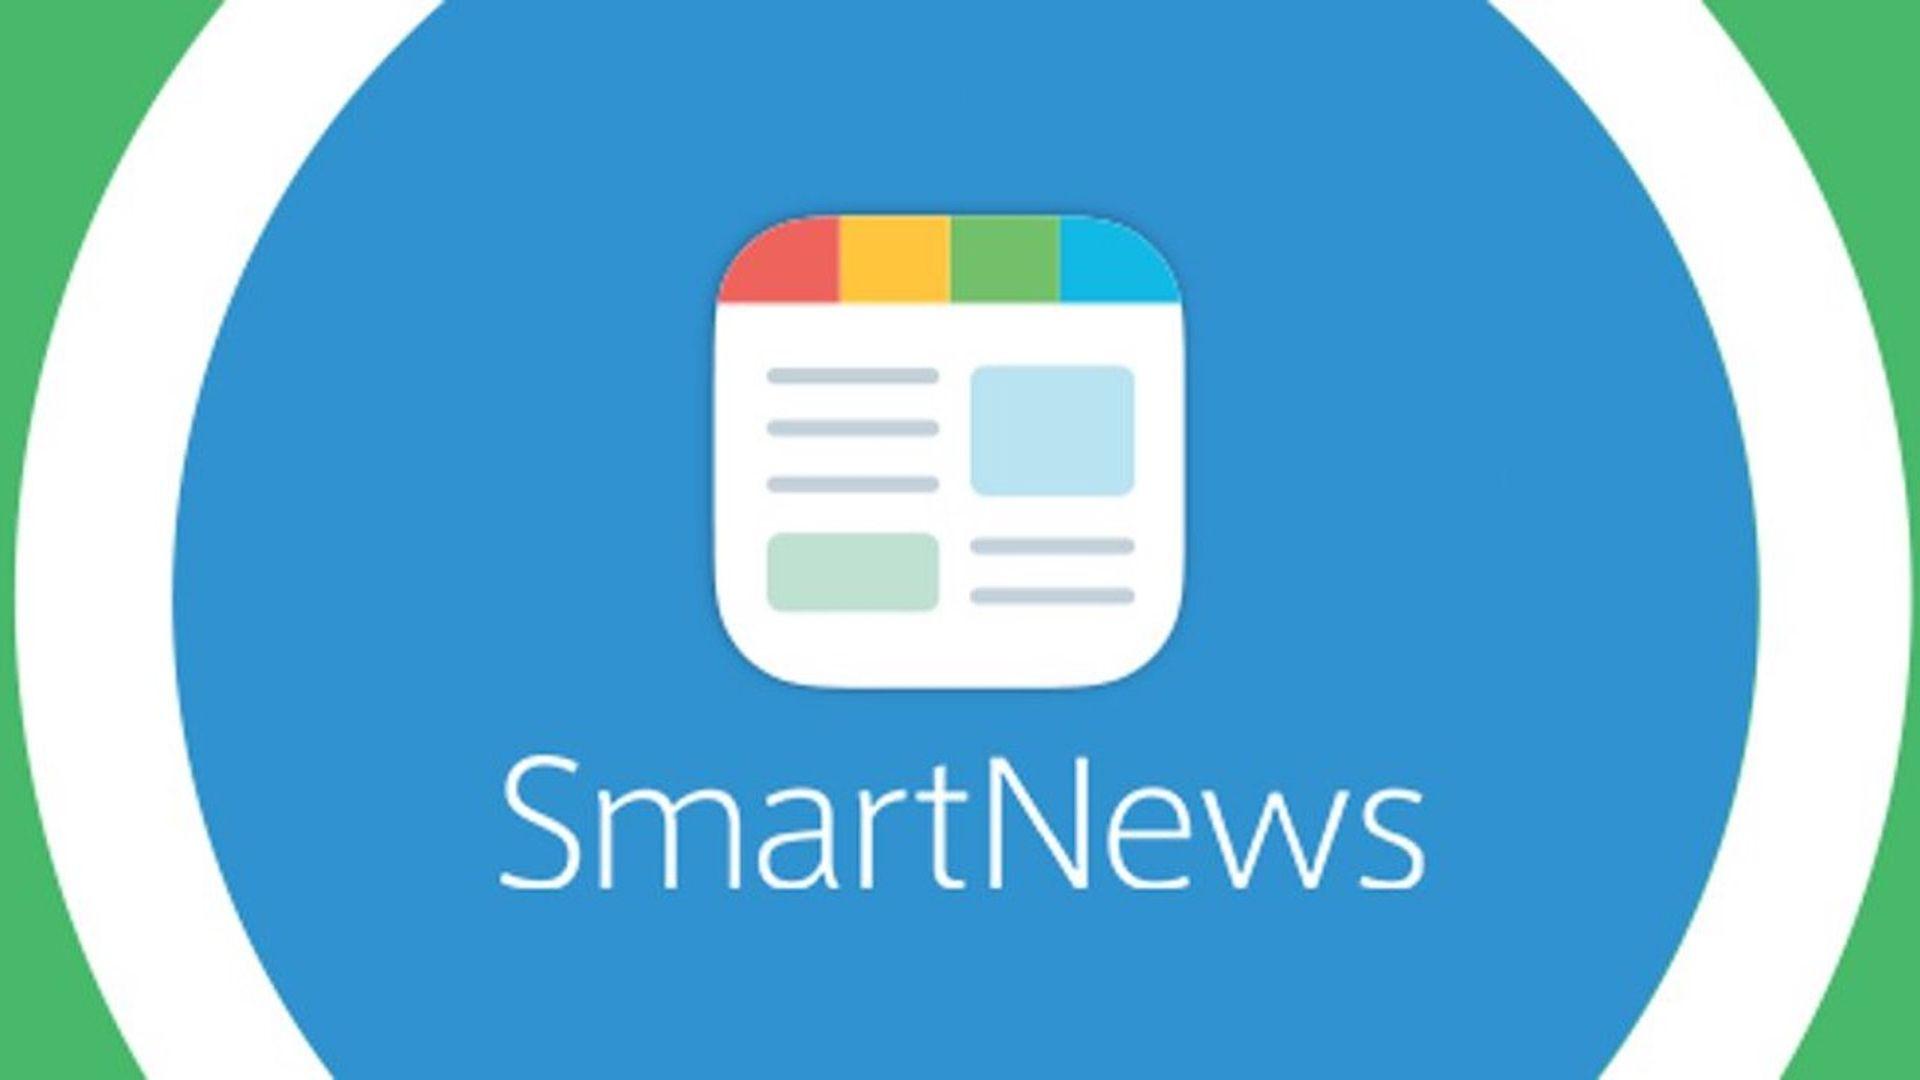 SmartNews raises 0M at a B valuation